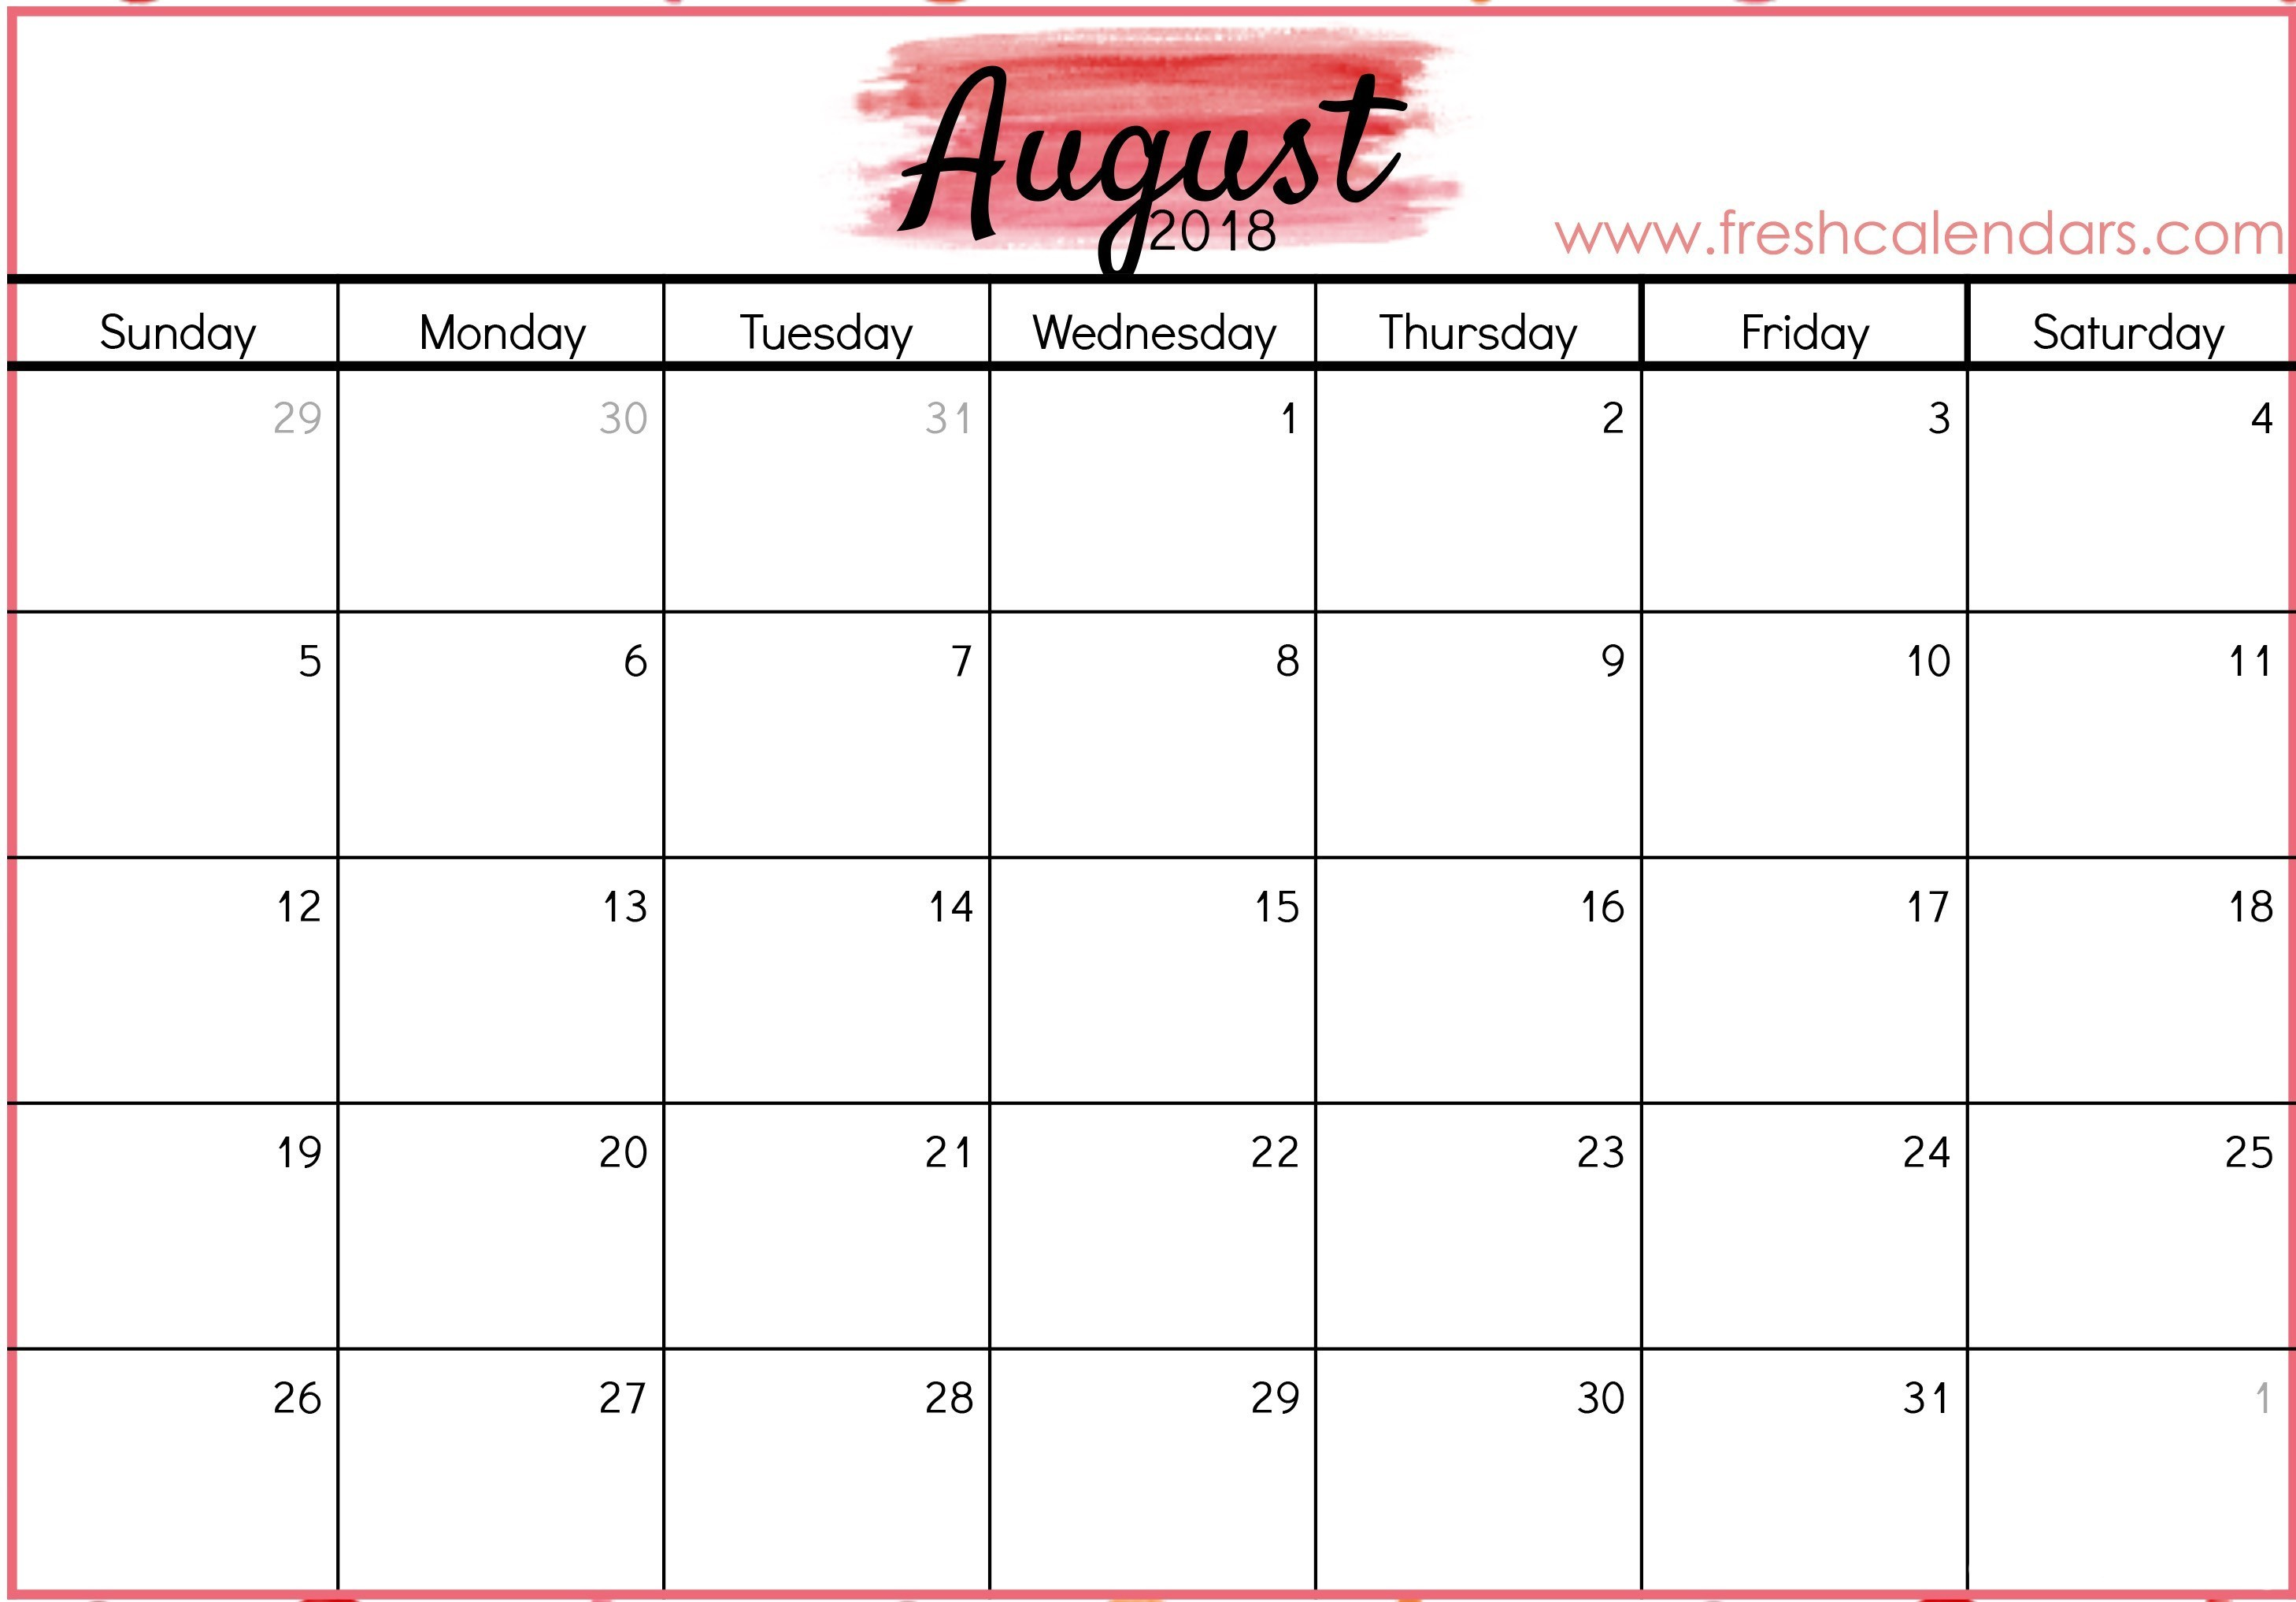 Calendario 2019 Julio Agosto Septiembre.Anuncios Calendario De Julio Agosto Y Septiembre 2019 Para